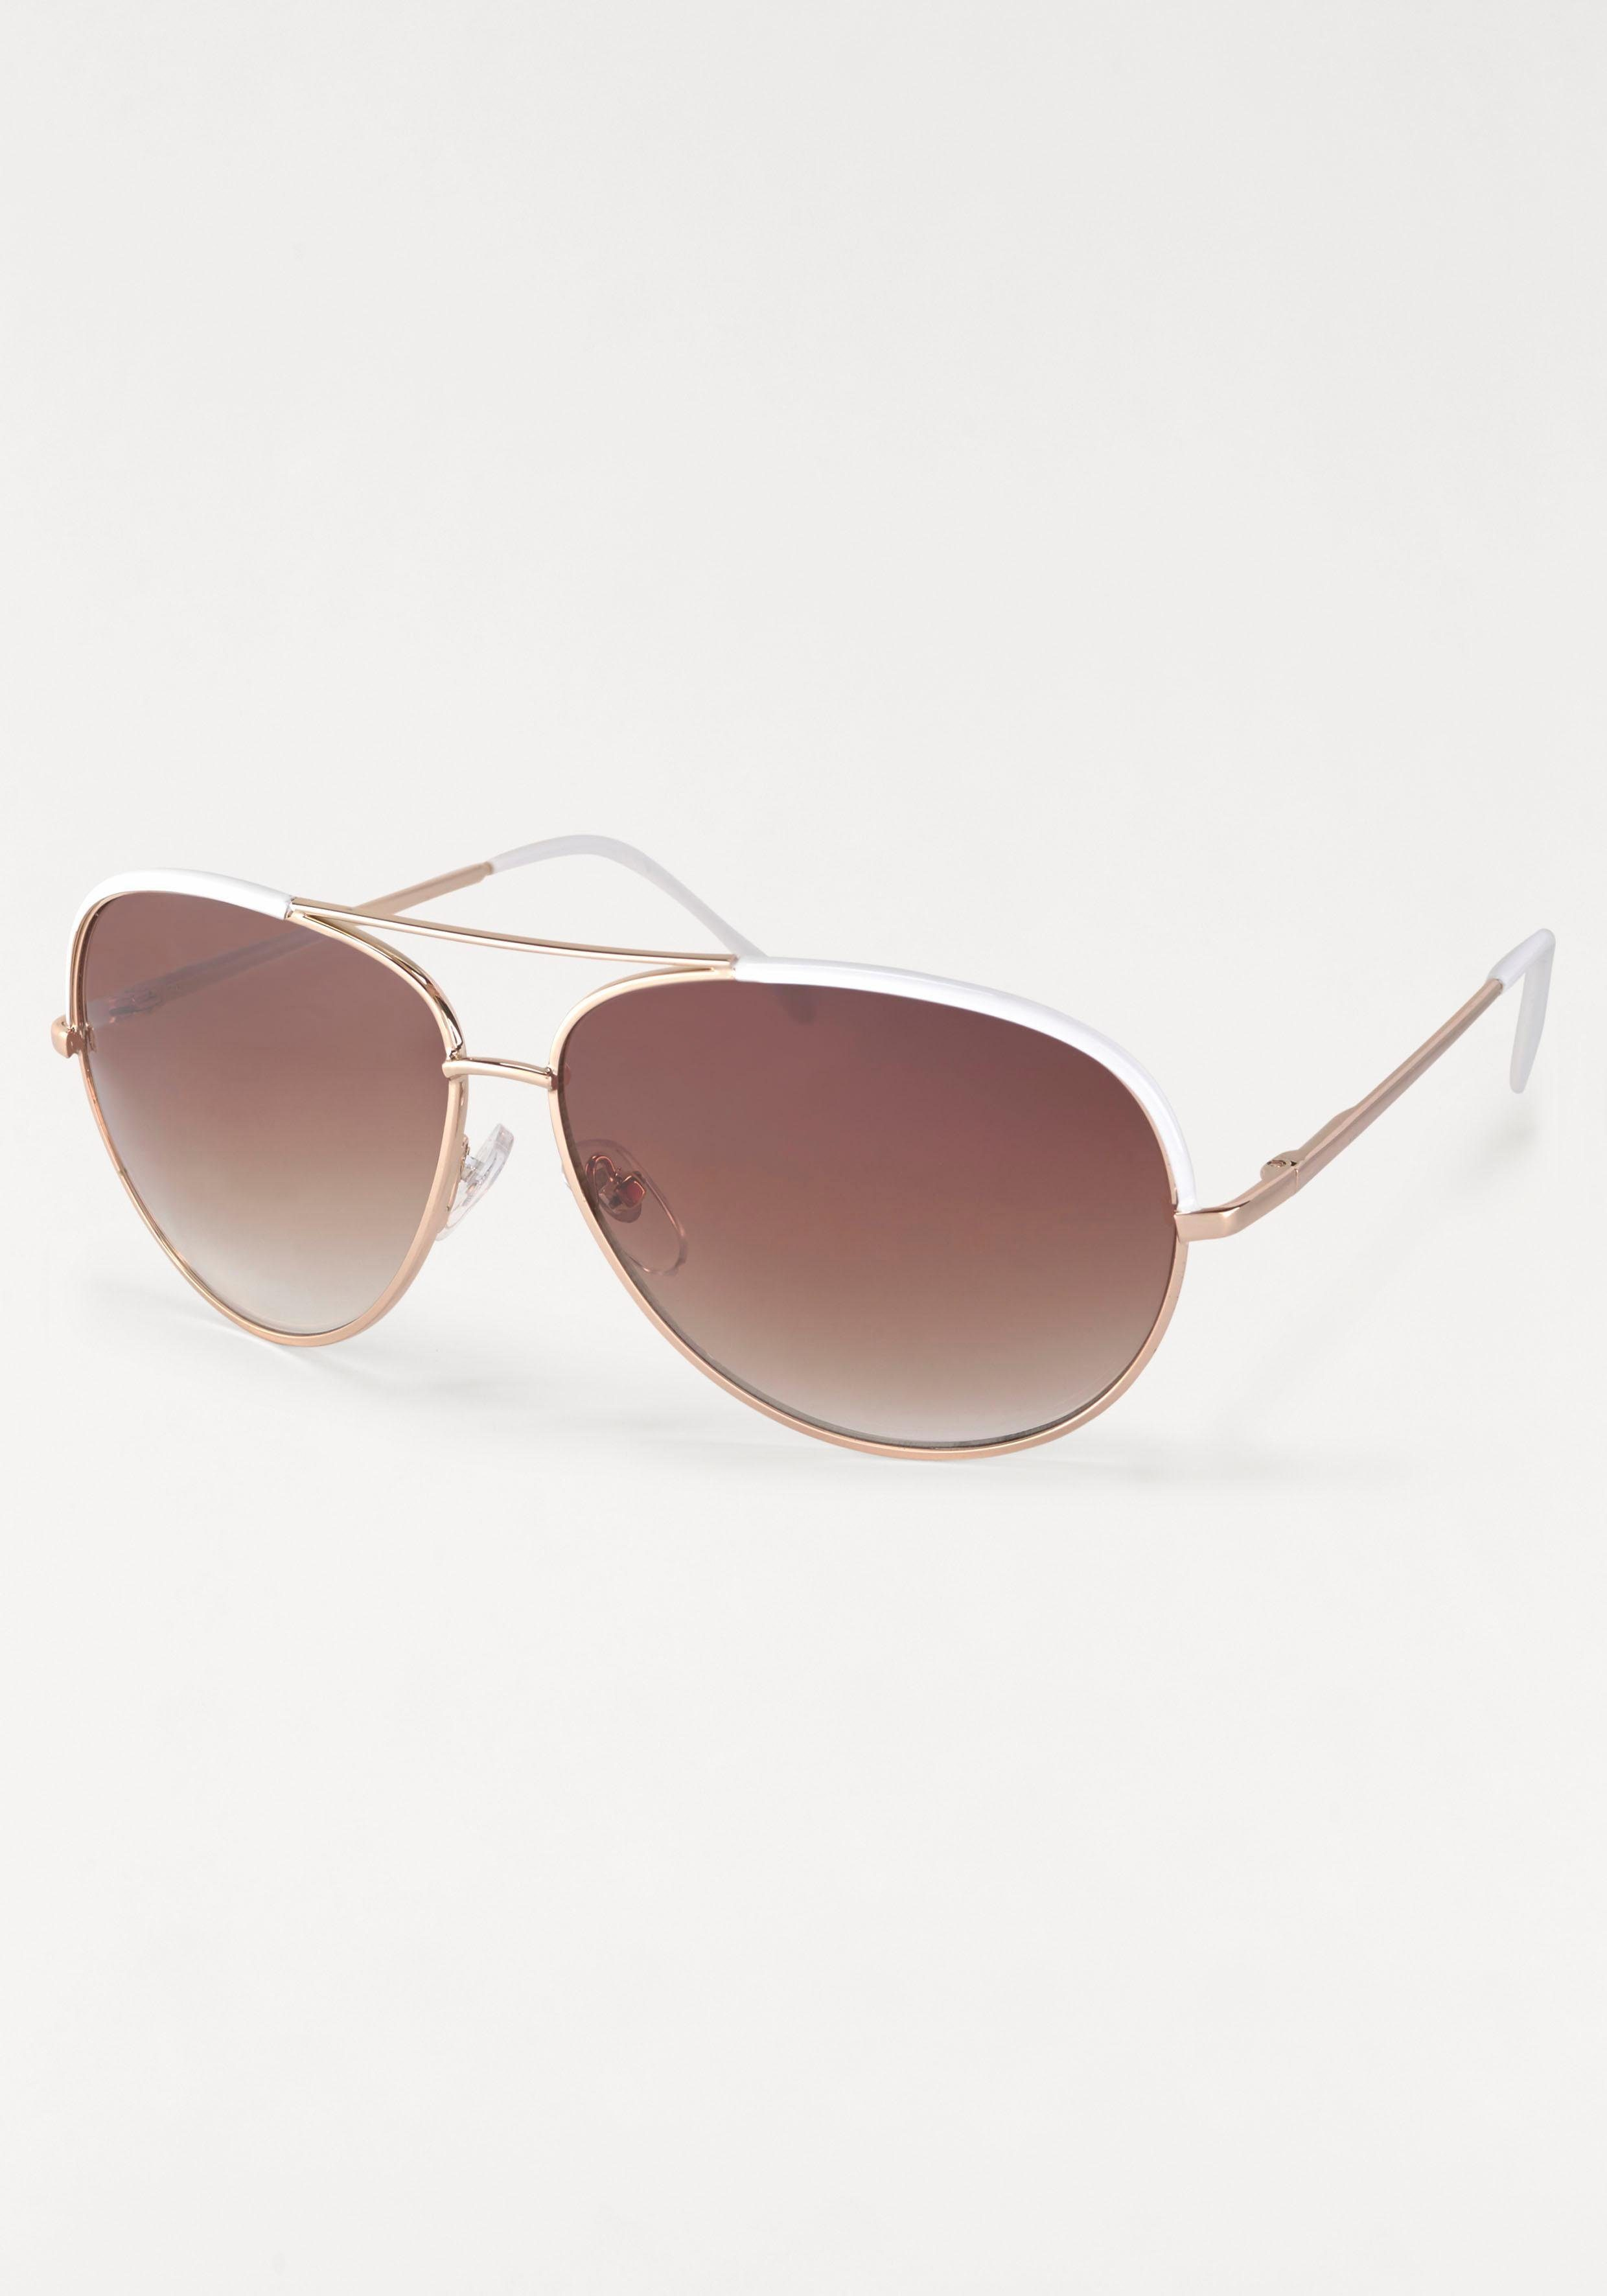 Sonnenbrille im Piloten-Stil, Aviator Look, Metallgestell